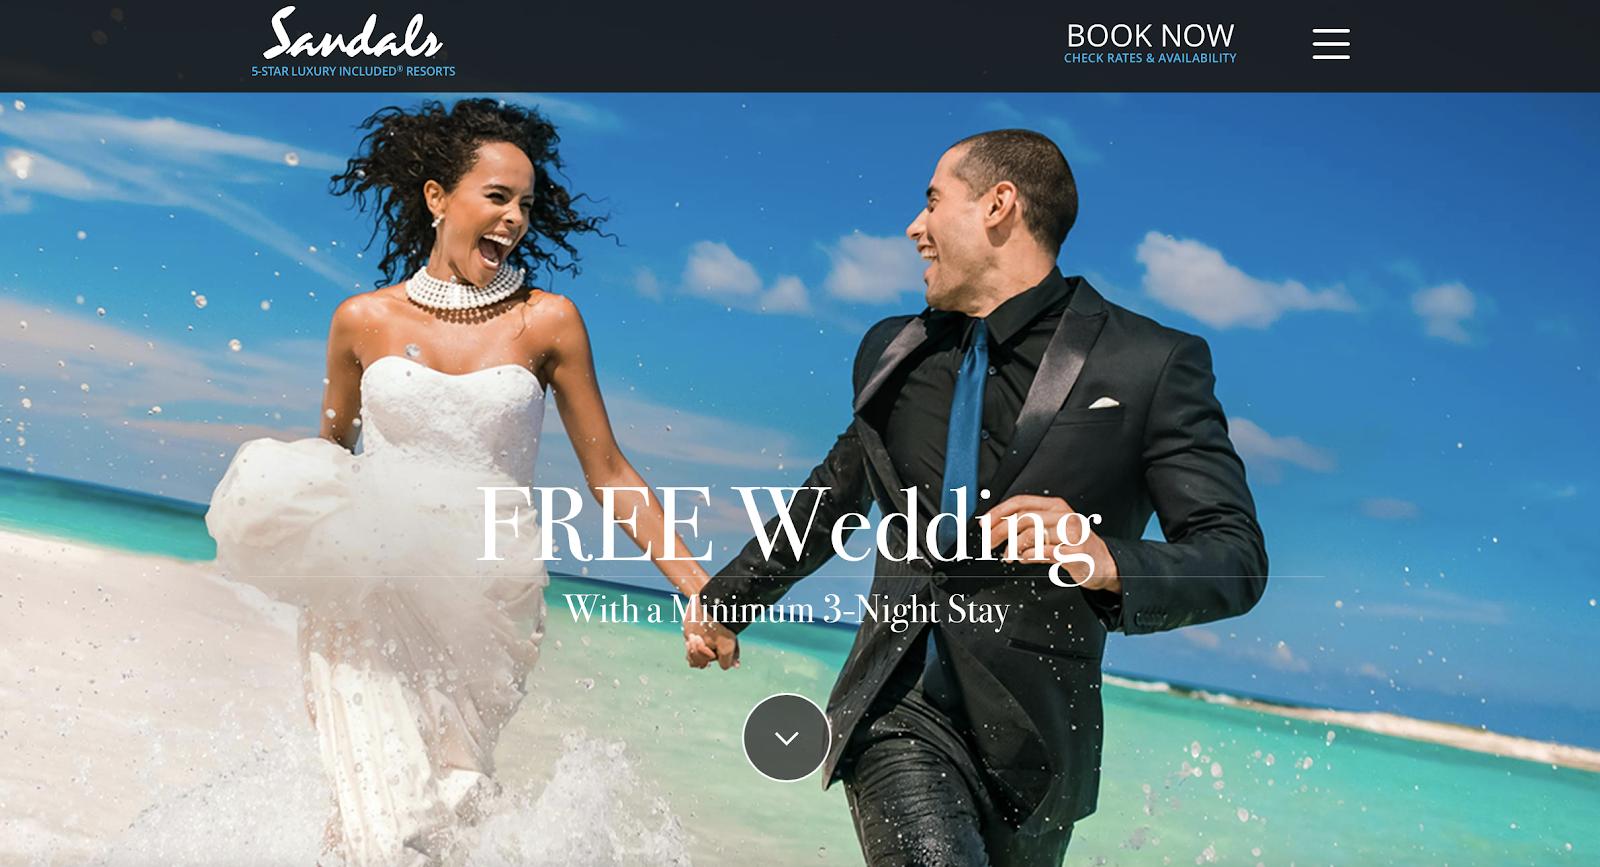 Sandals free wedding homepage